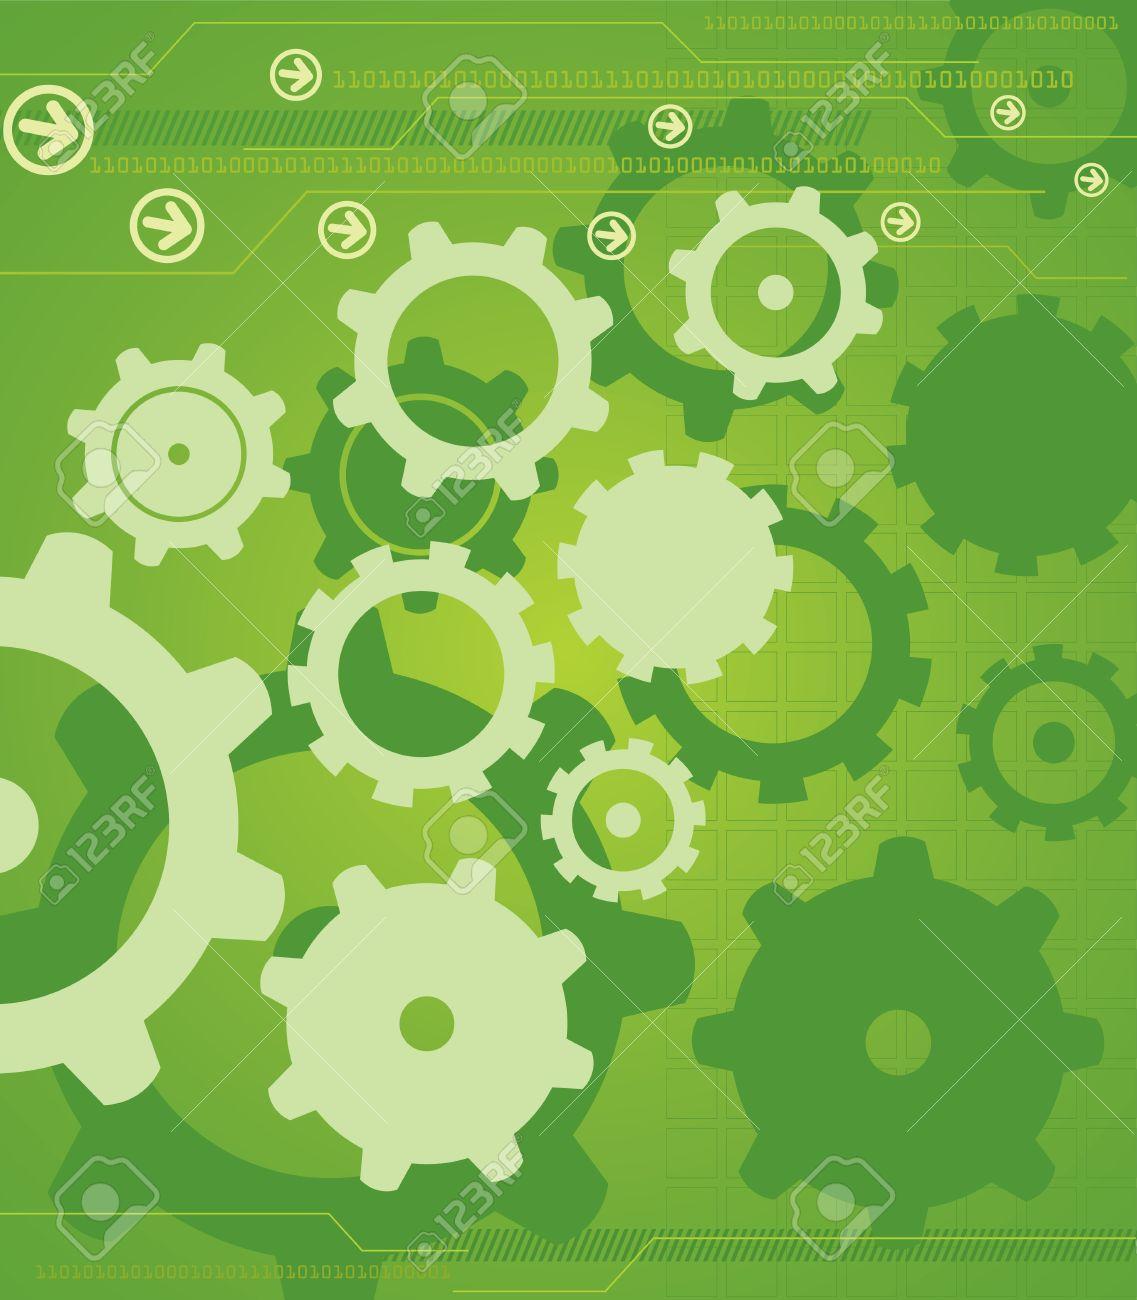 HighTech Industrial Background Stock Vector - 4653783